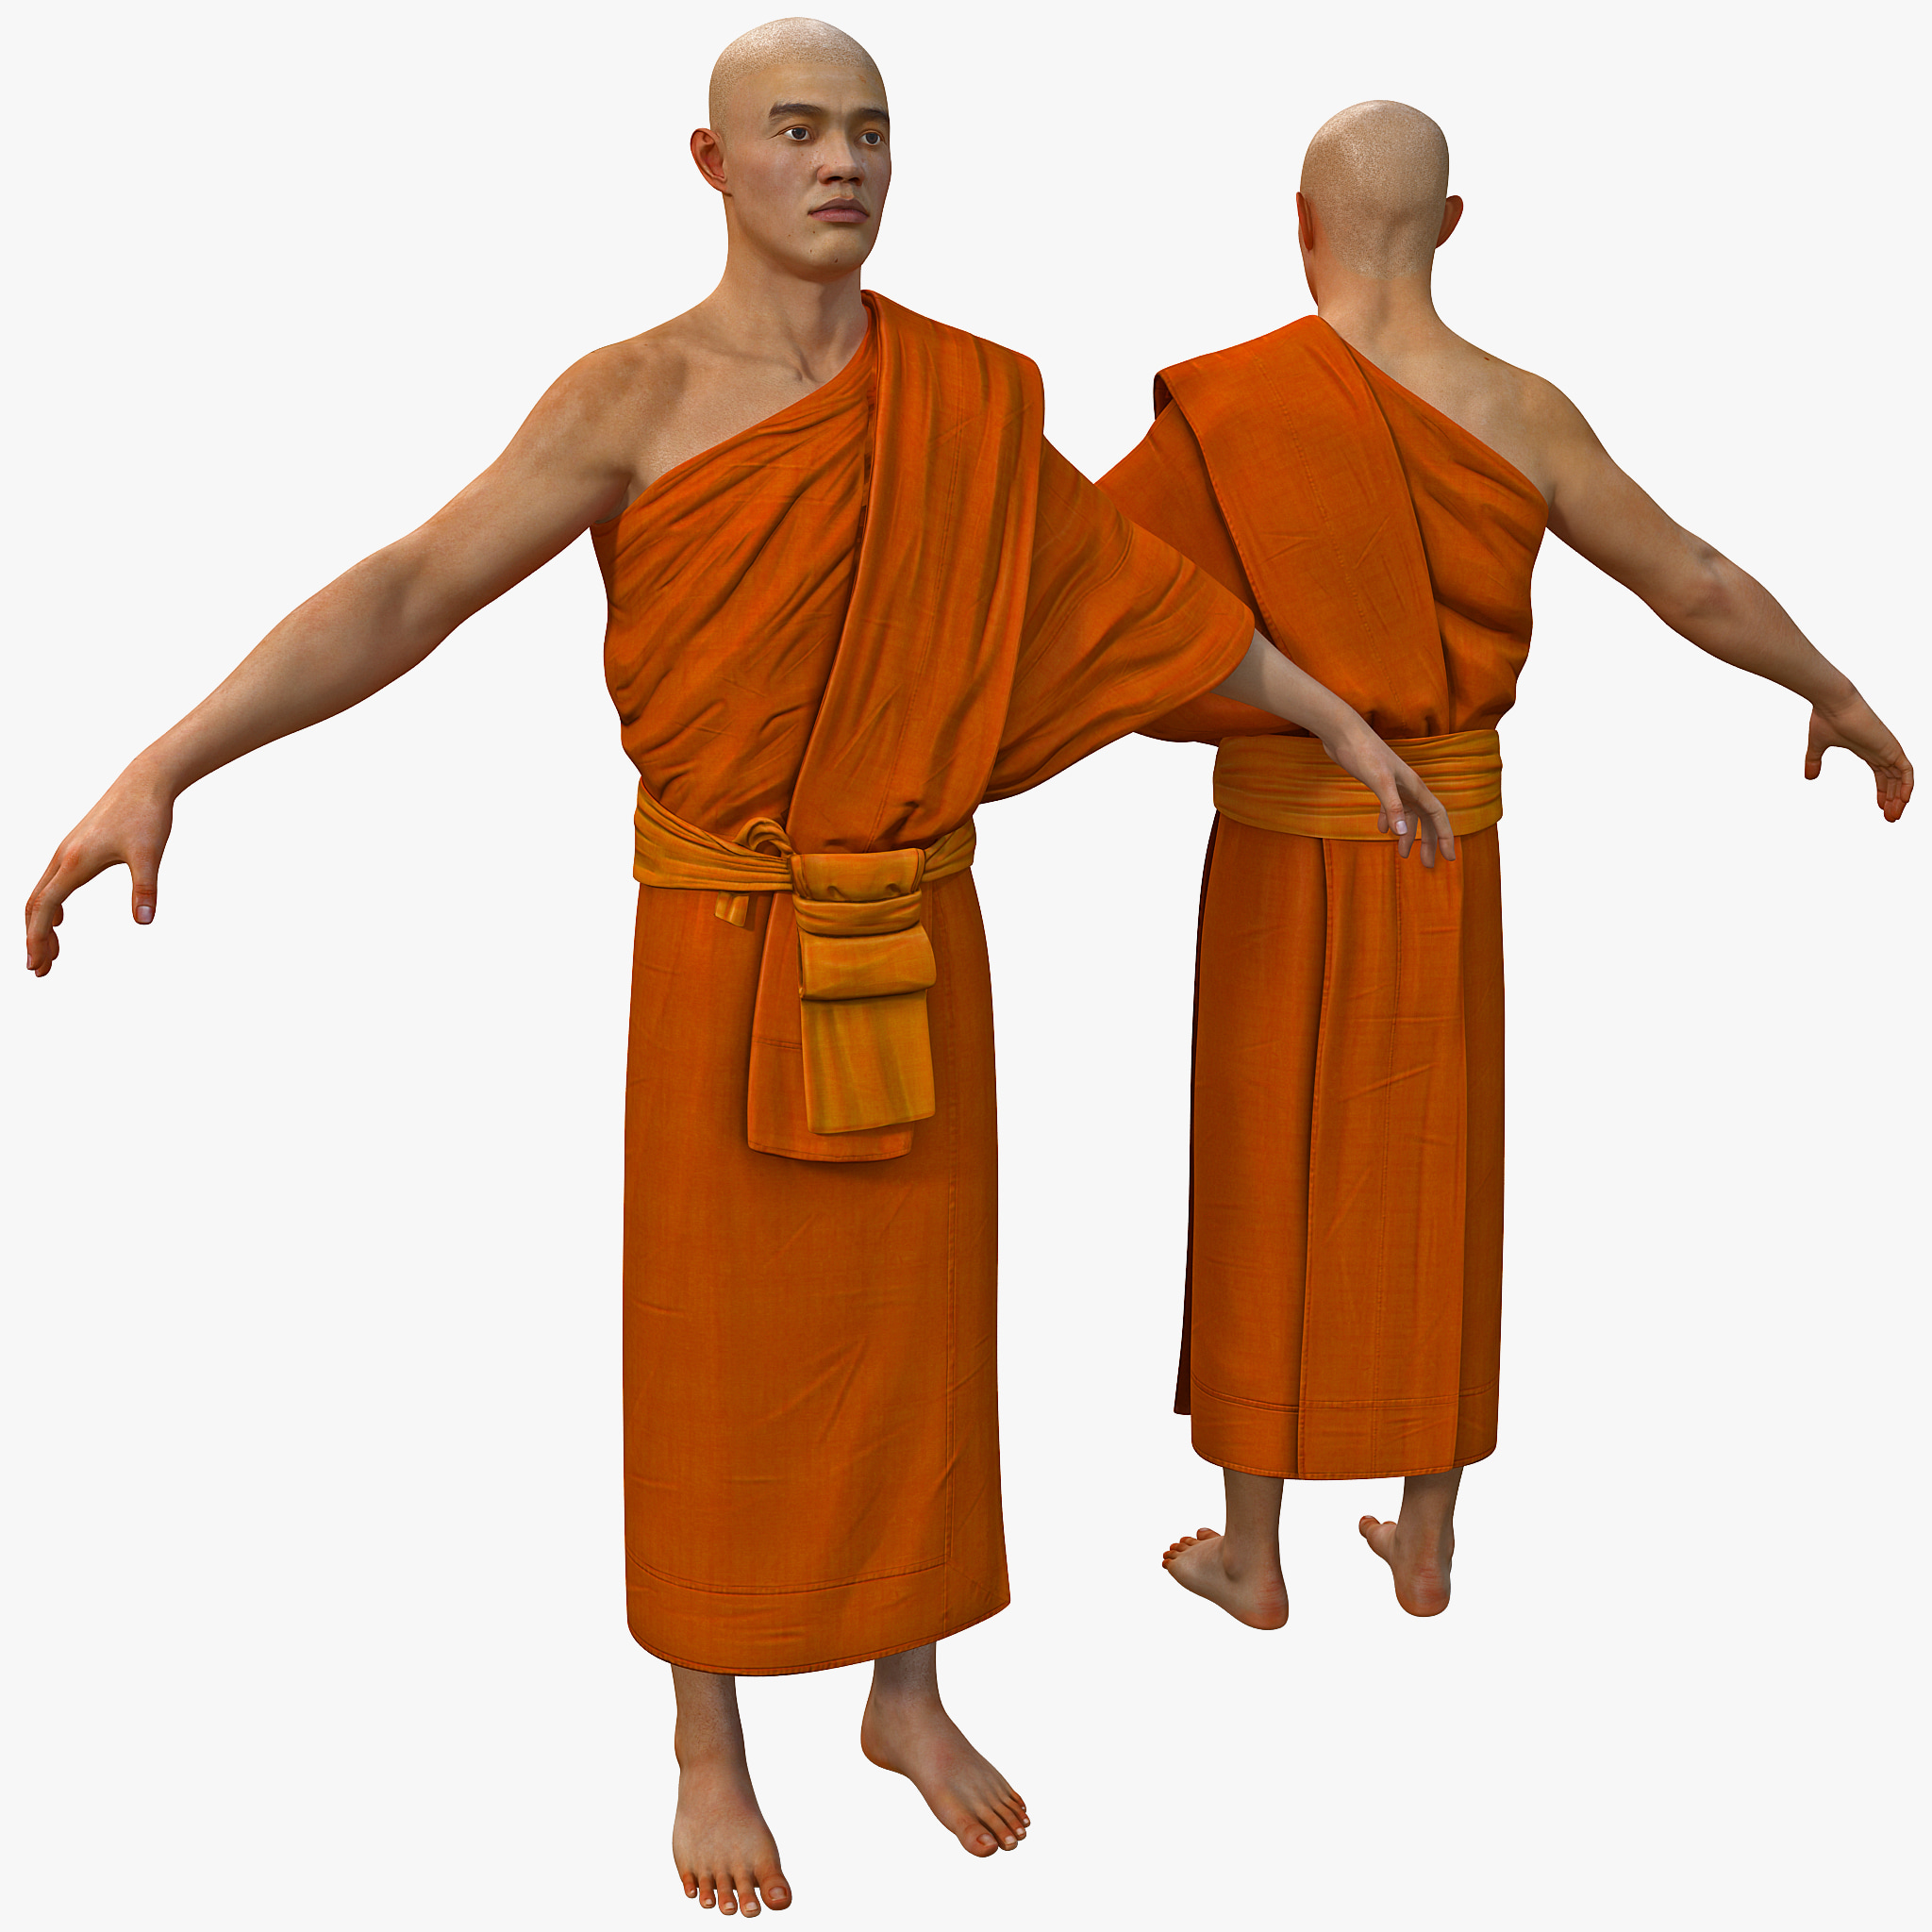 BuddhistMonkRigged_1.jpg035337fd-9324-4a